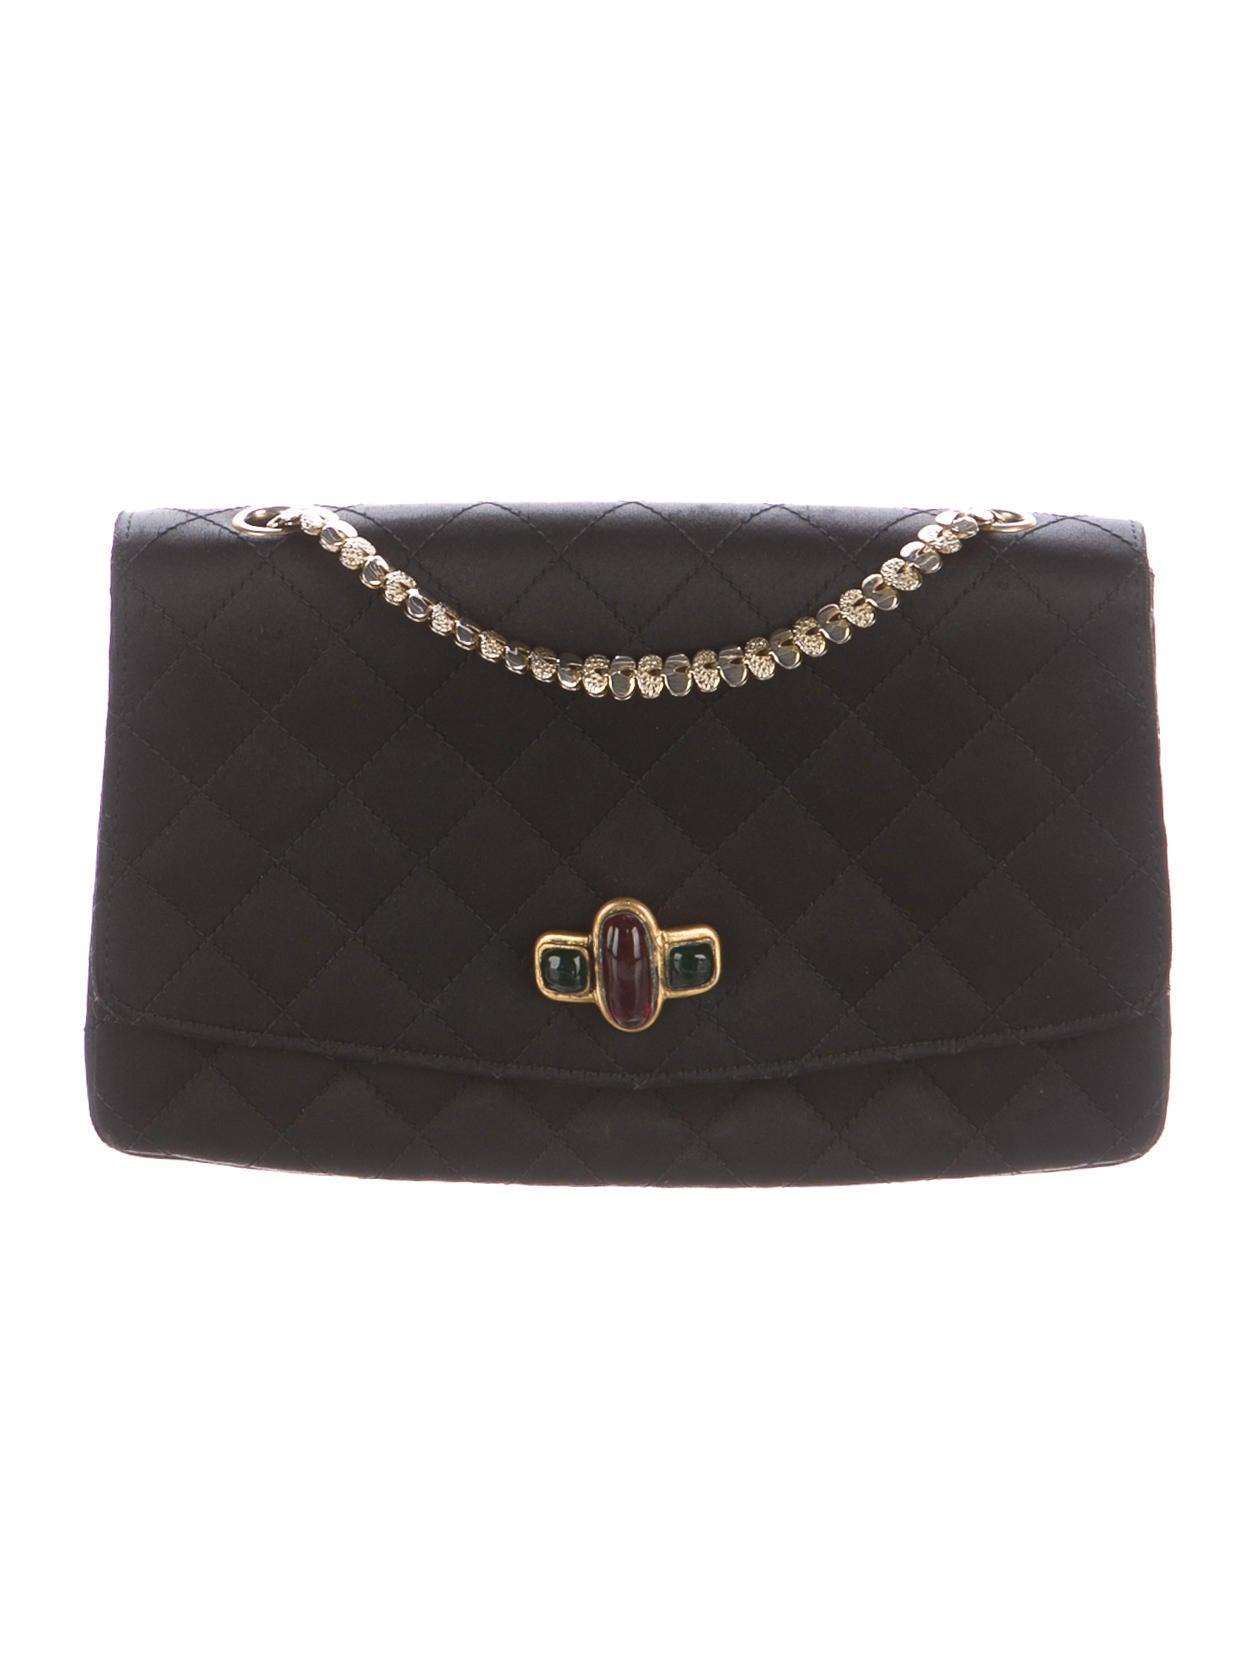 Bijoux Vintage Chanel : Chanel vintage satin bijoux flap bag handbags